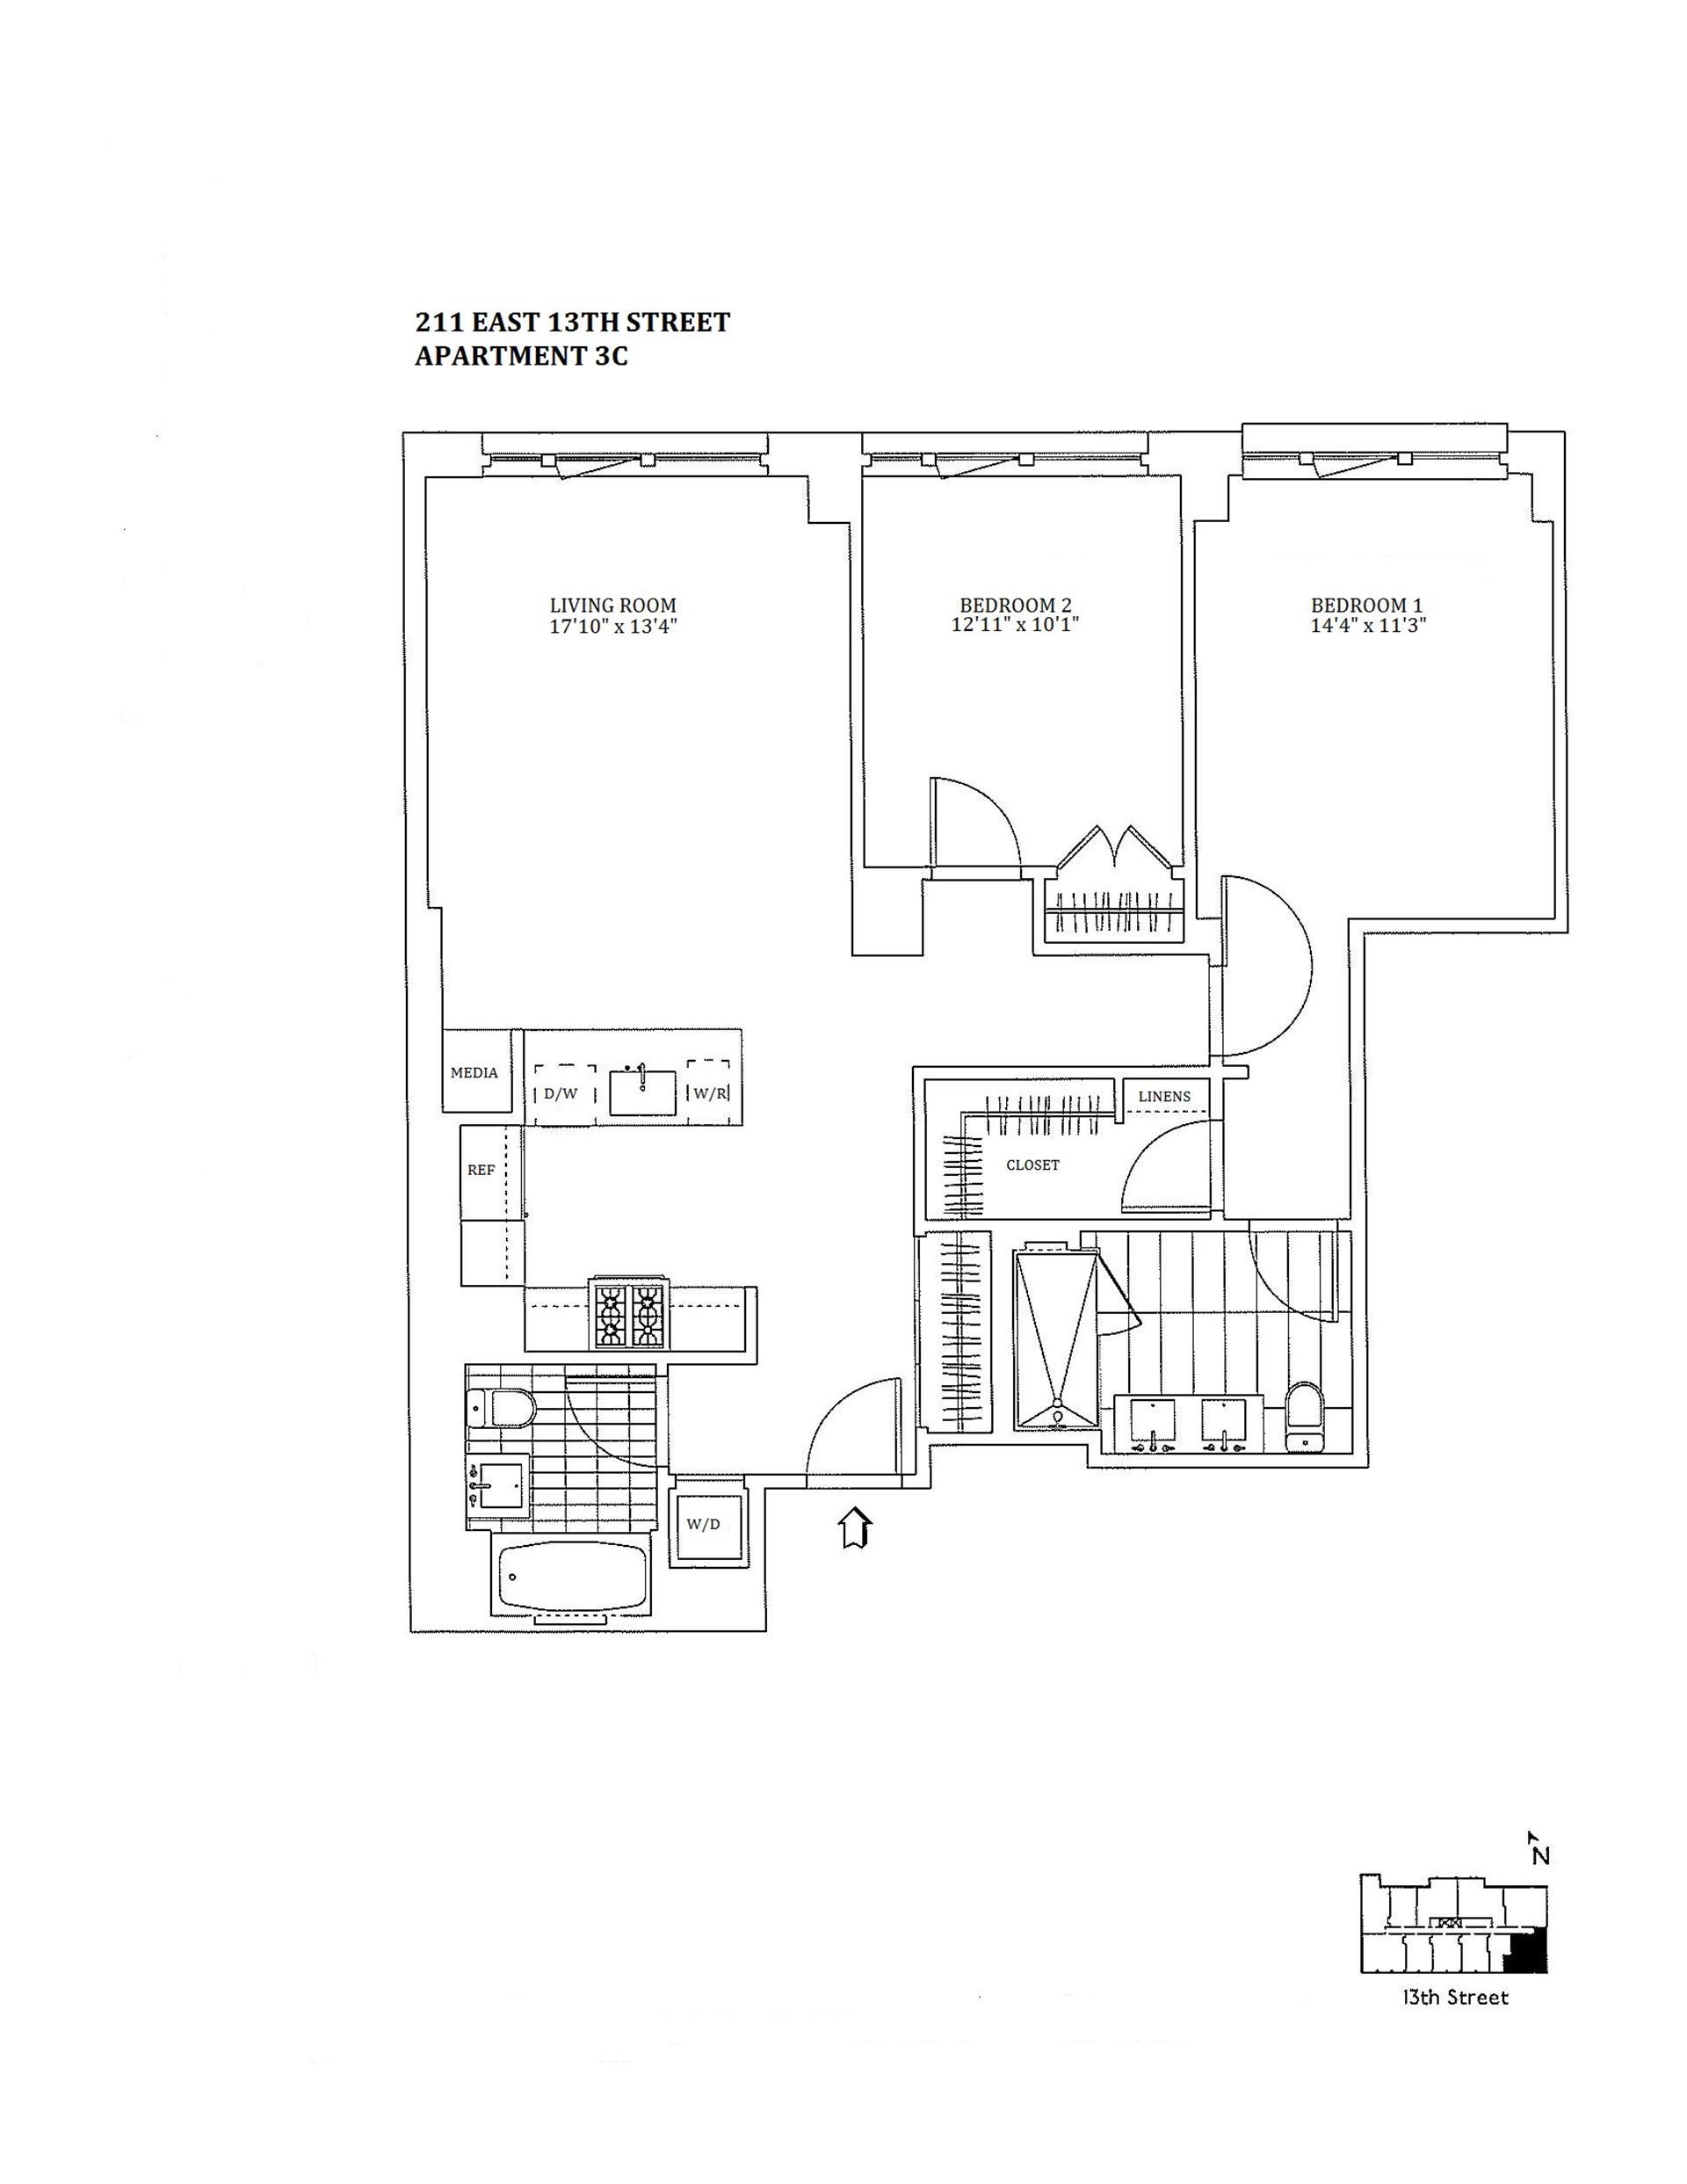 Floor plan of The Jefferson, 211 East 13th St, 3C - East Village, New York